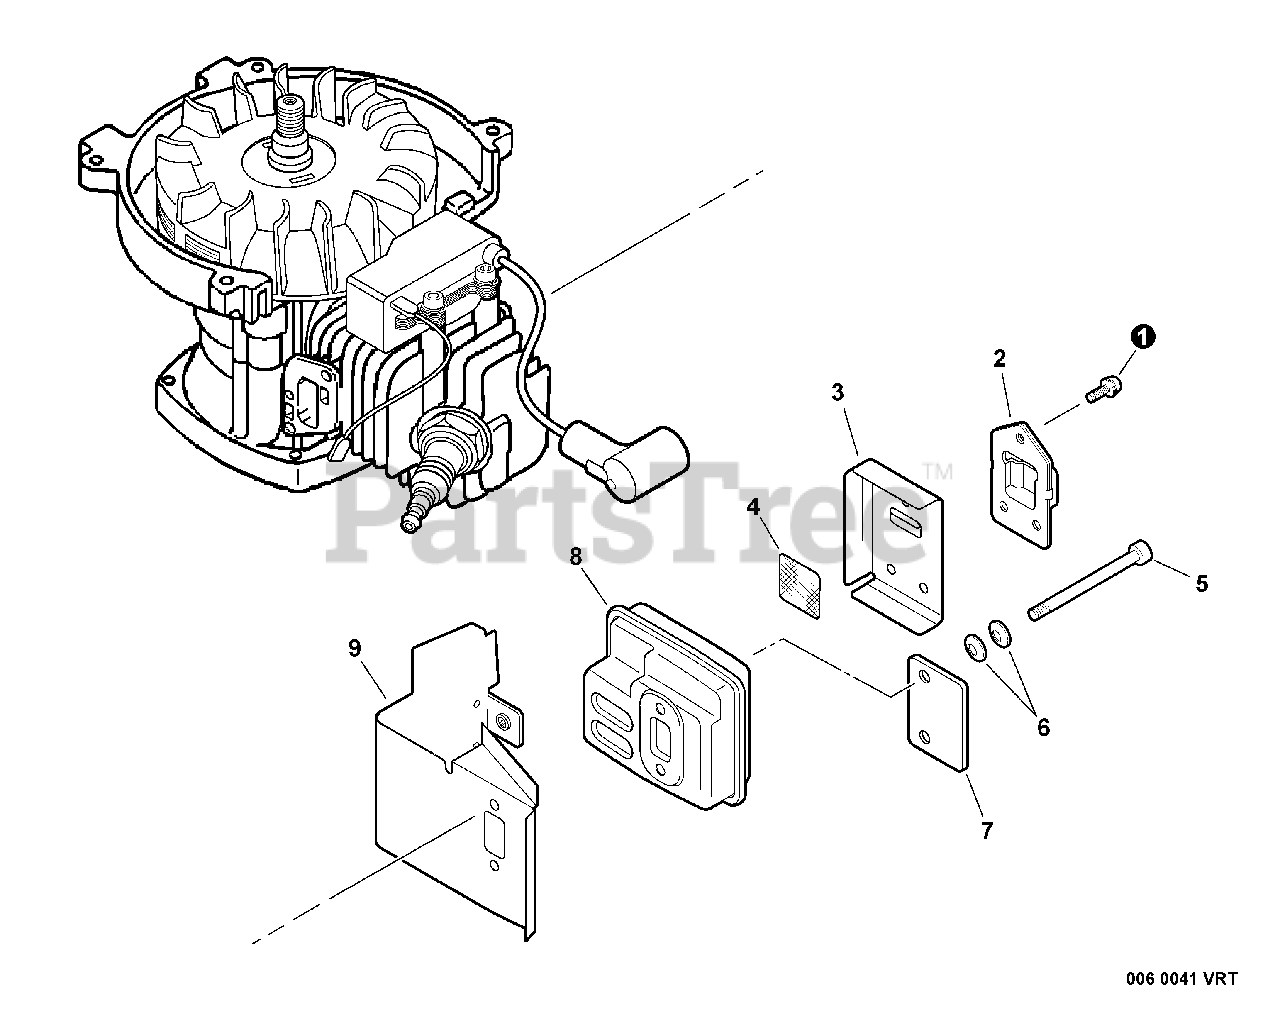 Little Wonder SV-5C/2 - Little Wonder Engine (SN: 10001001 - 10999999)  Exhaust Parts Lookup with Diagrams | PartsTreePartsTree